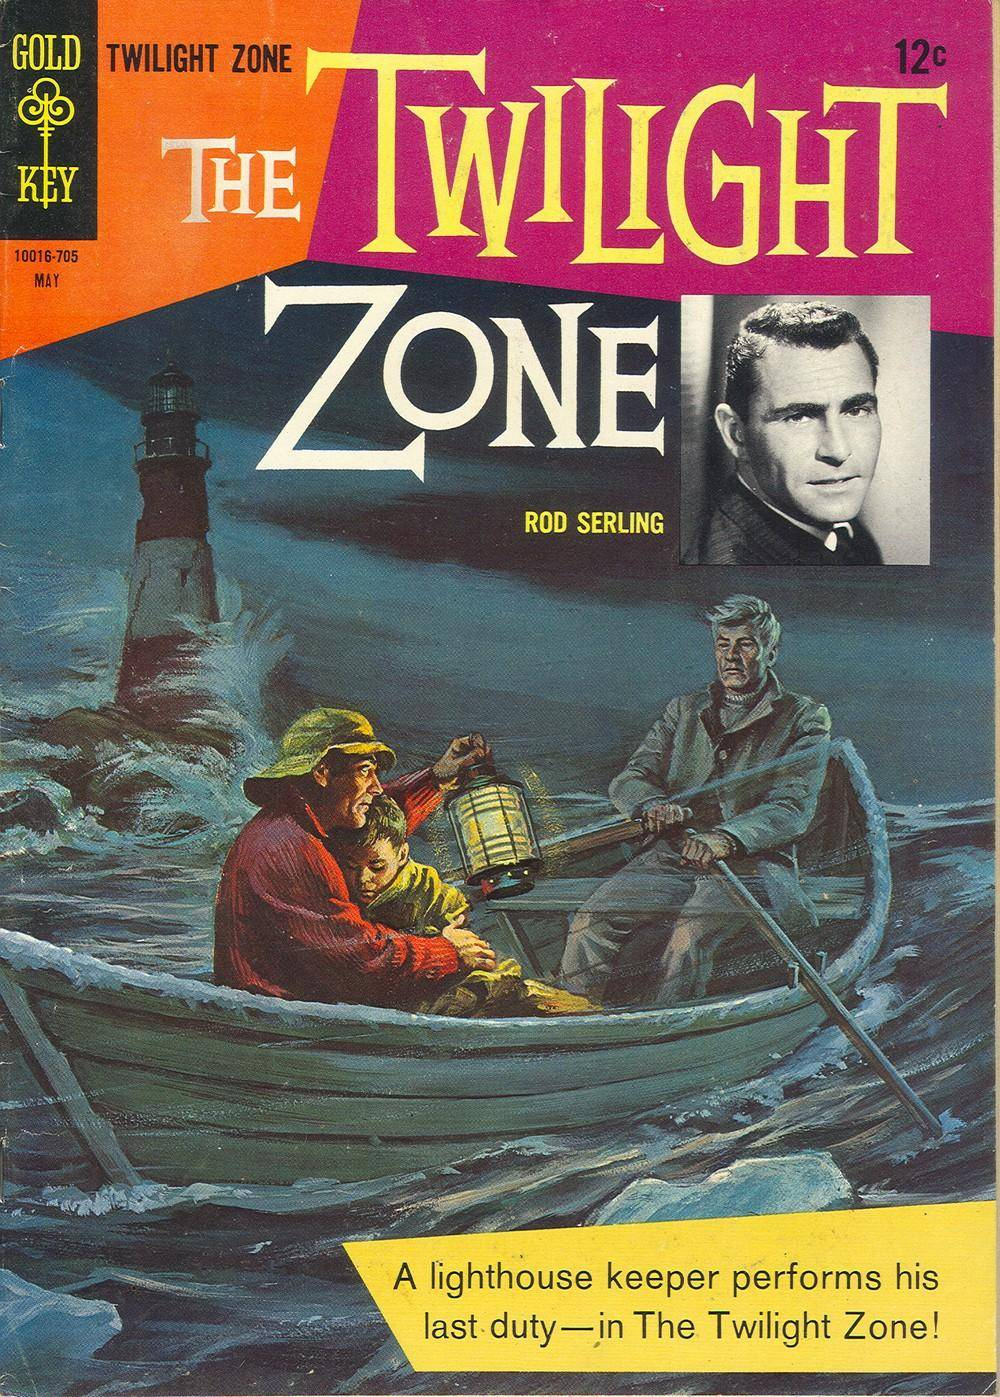 The Twilight Zone 021 1967 Gold Key